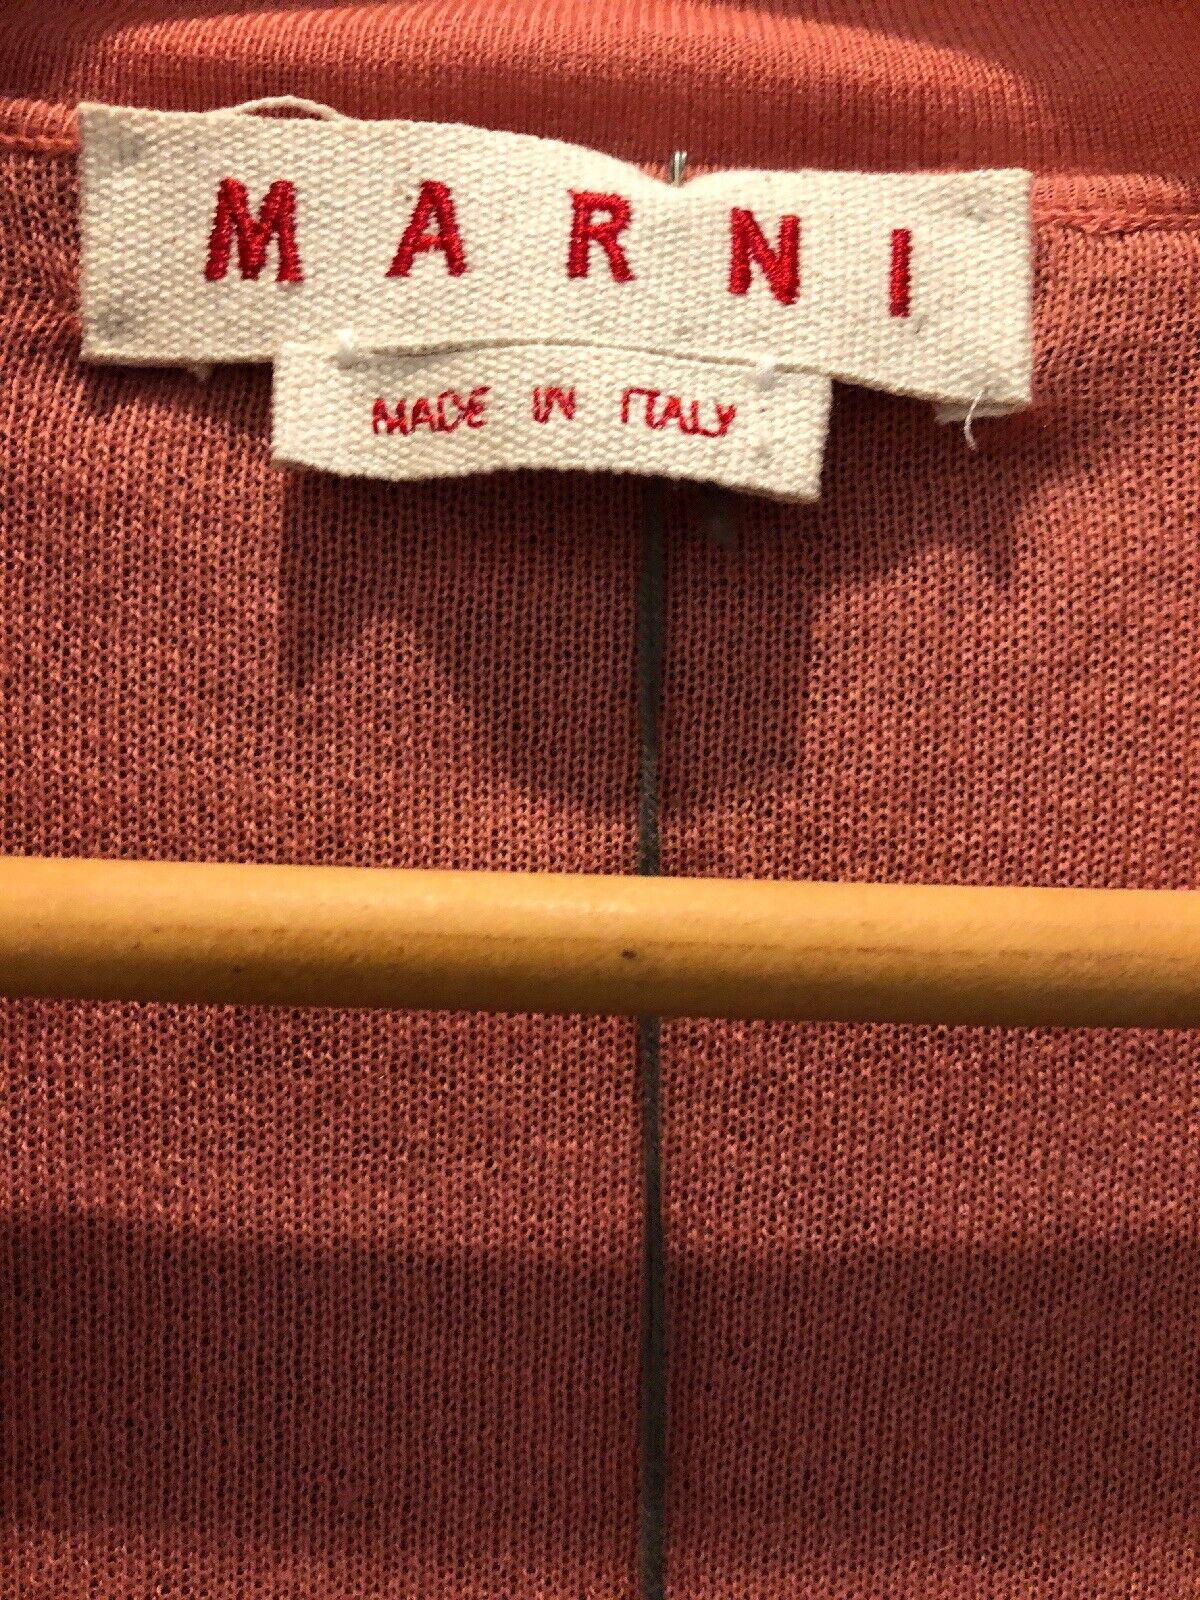 Marni Pink Women's Size Size Size 38 100% Cashmere Reversible Cardigan Retail  1300 12d7ab